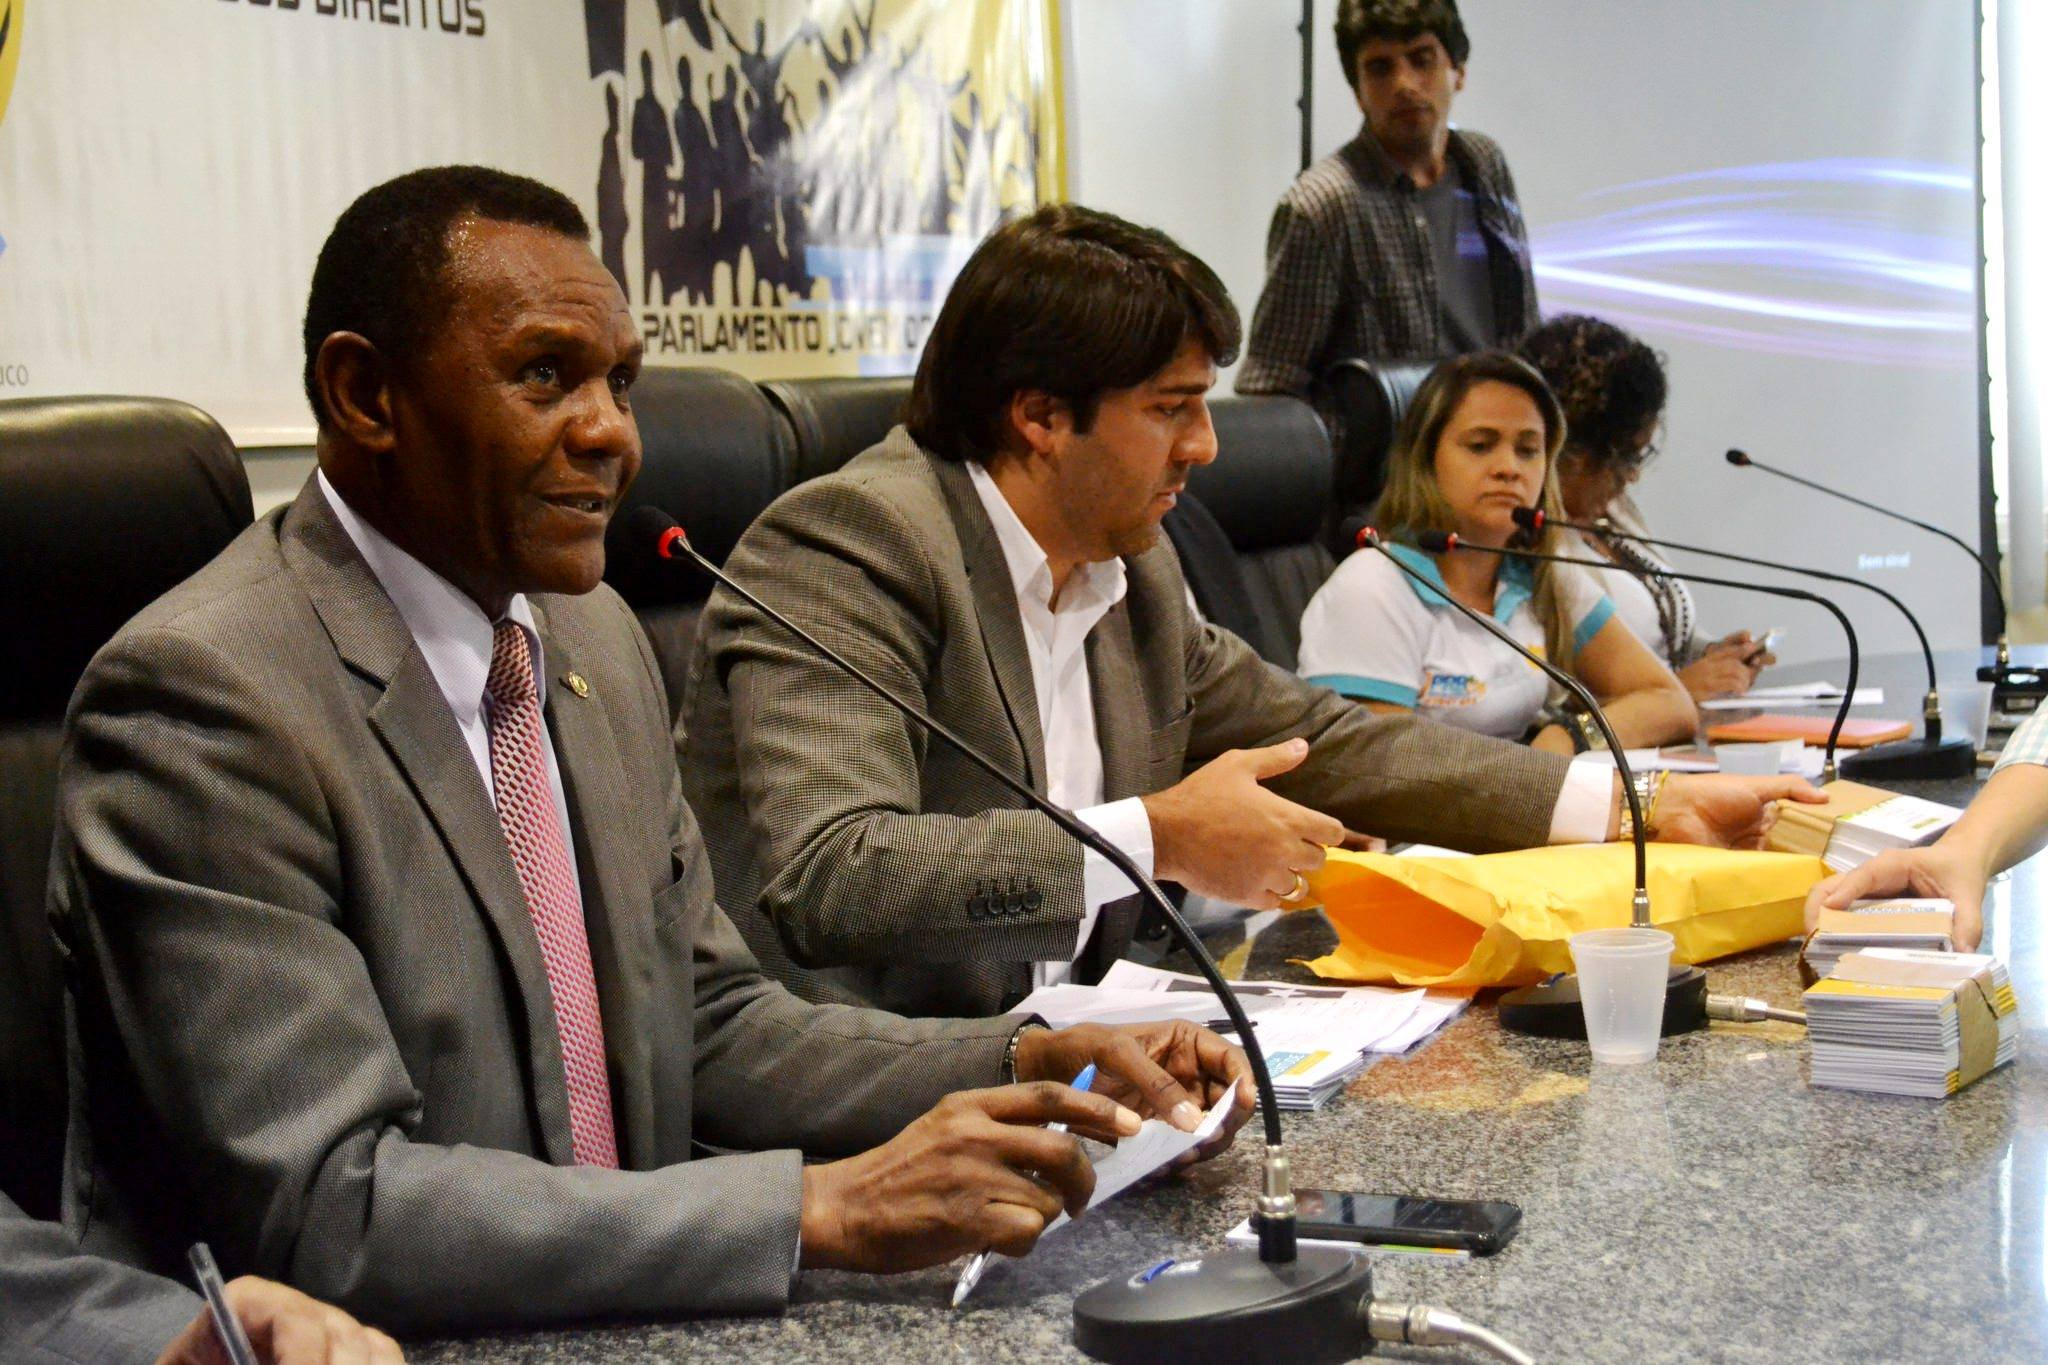 PRB Juventude elege oito novos vereadores jovens no Recife